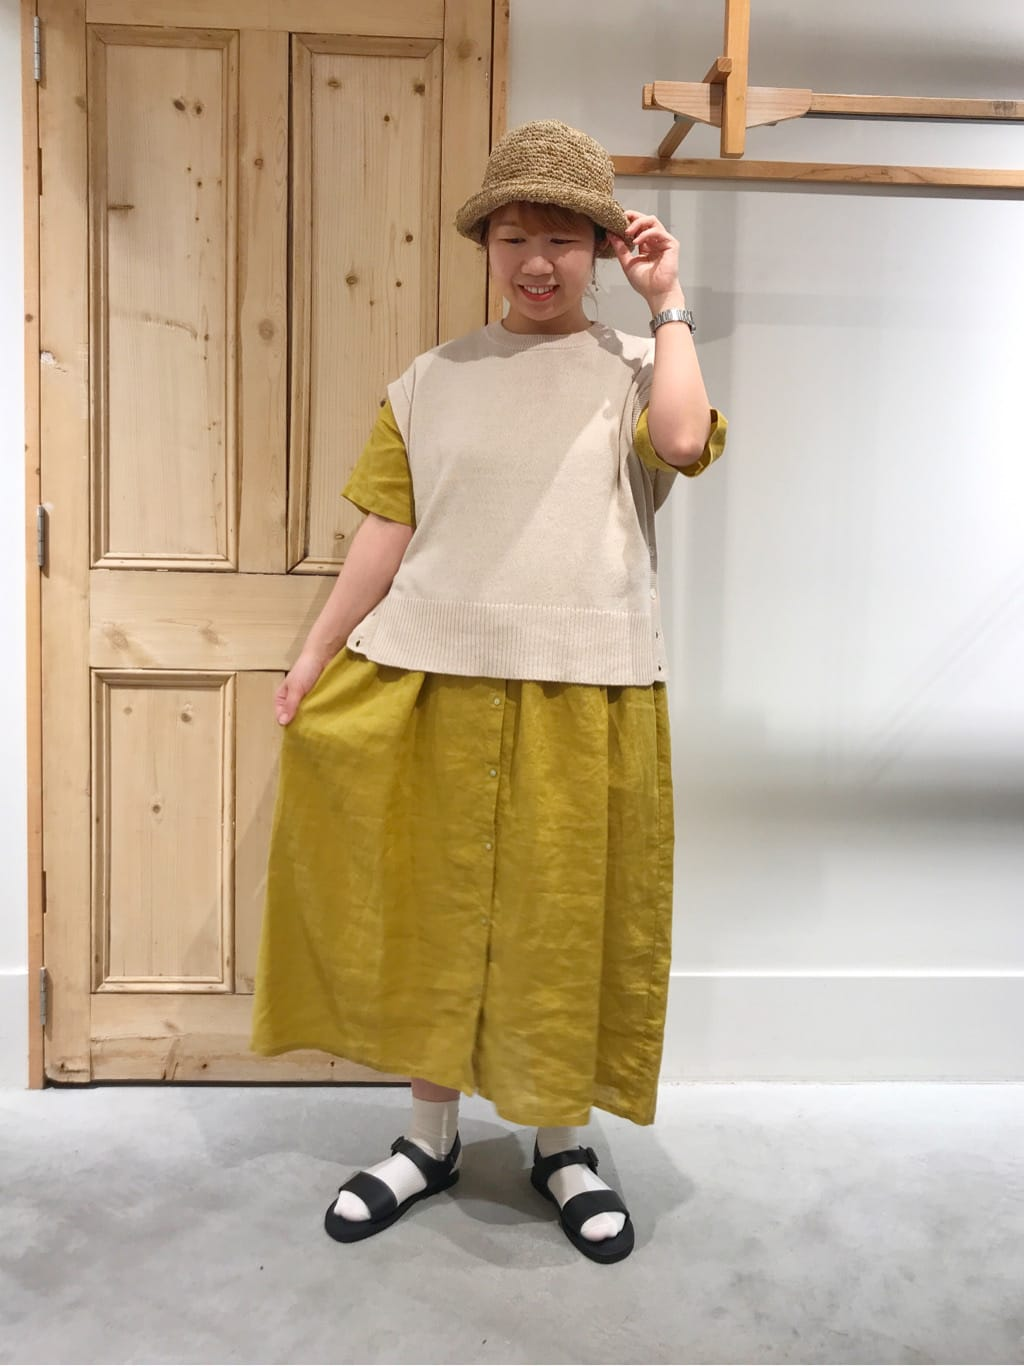 Malle chambre de charme 調布パルコ 身長:155cm 2021.06.30